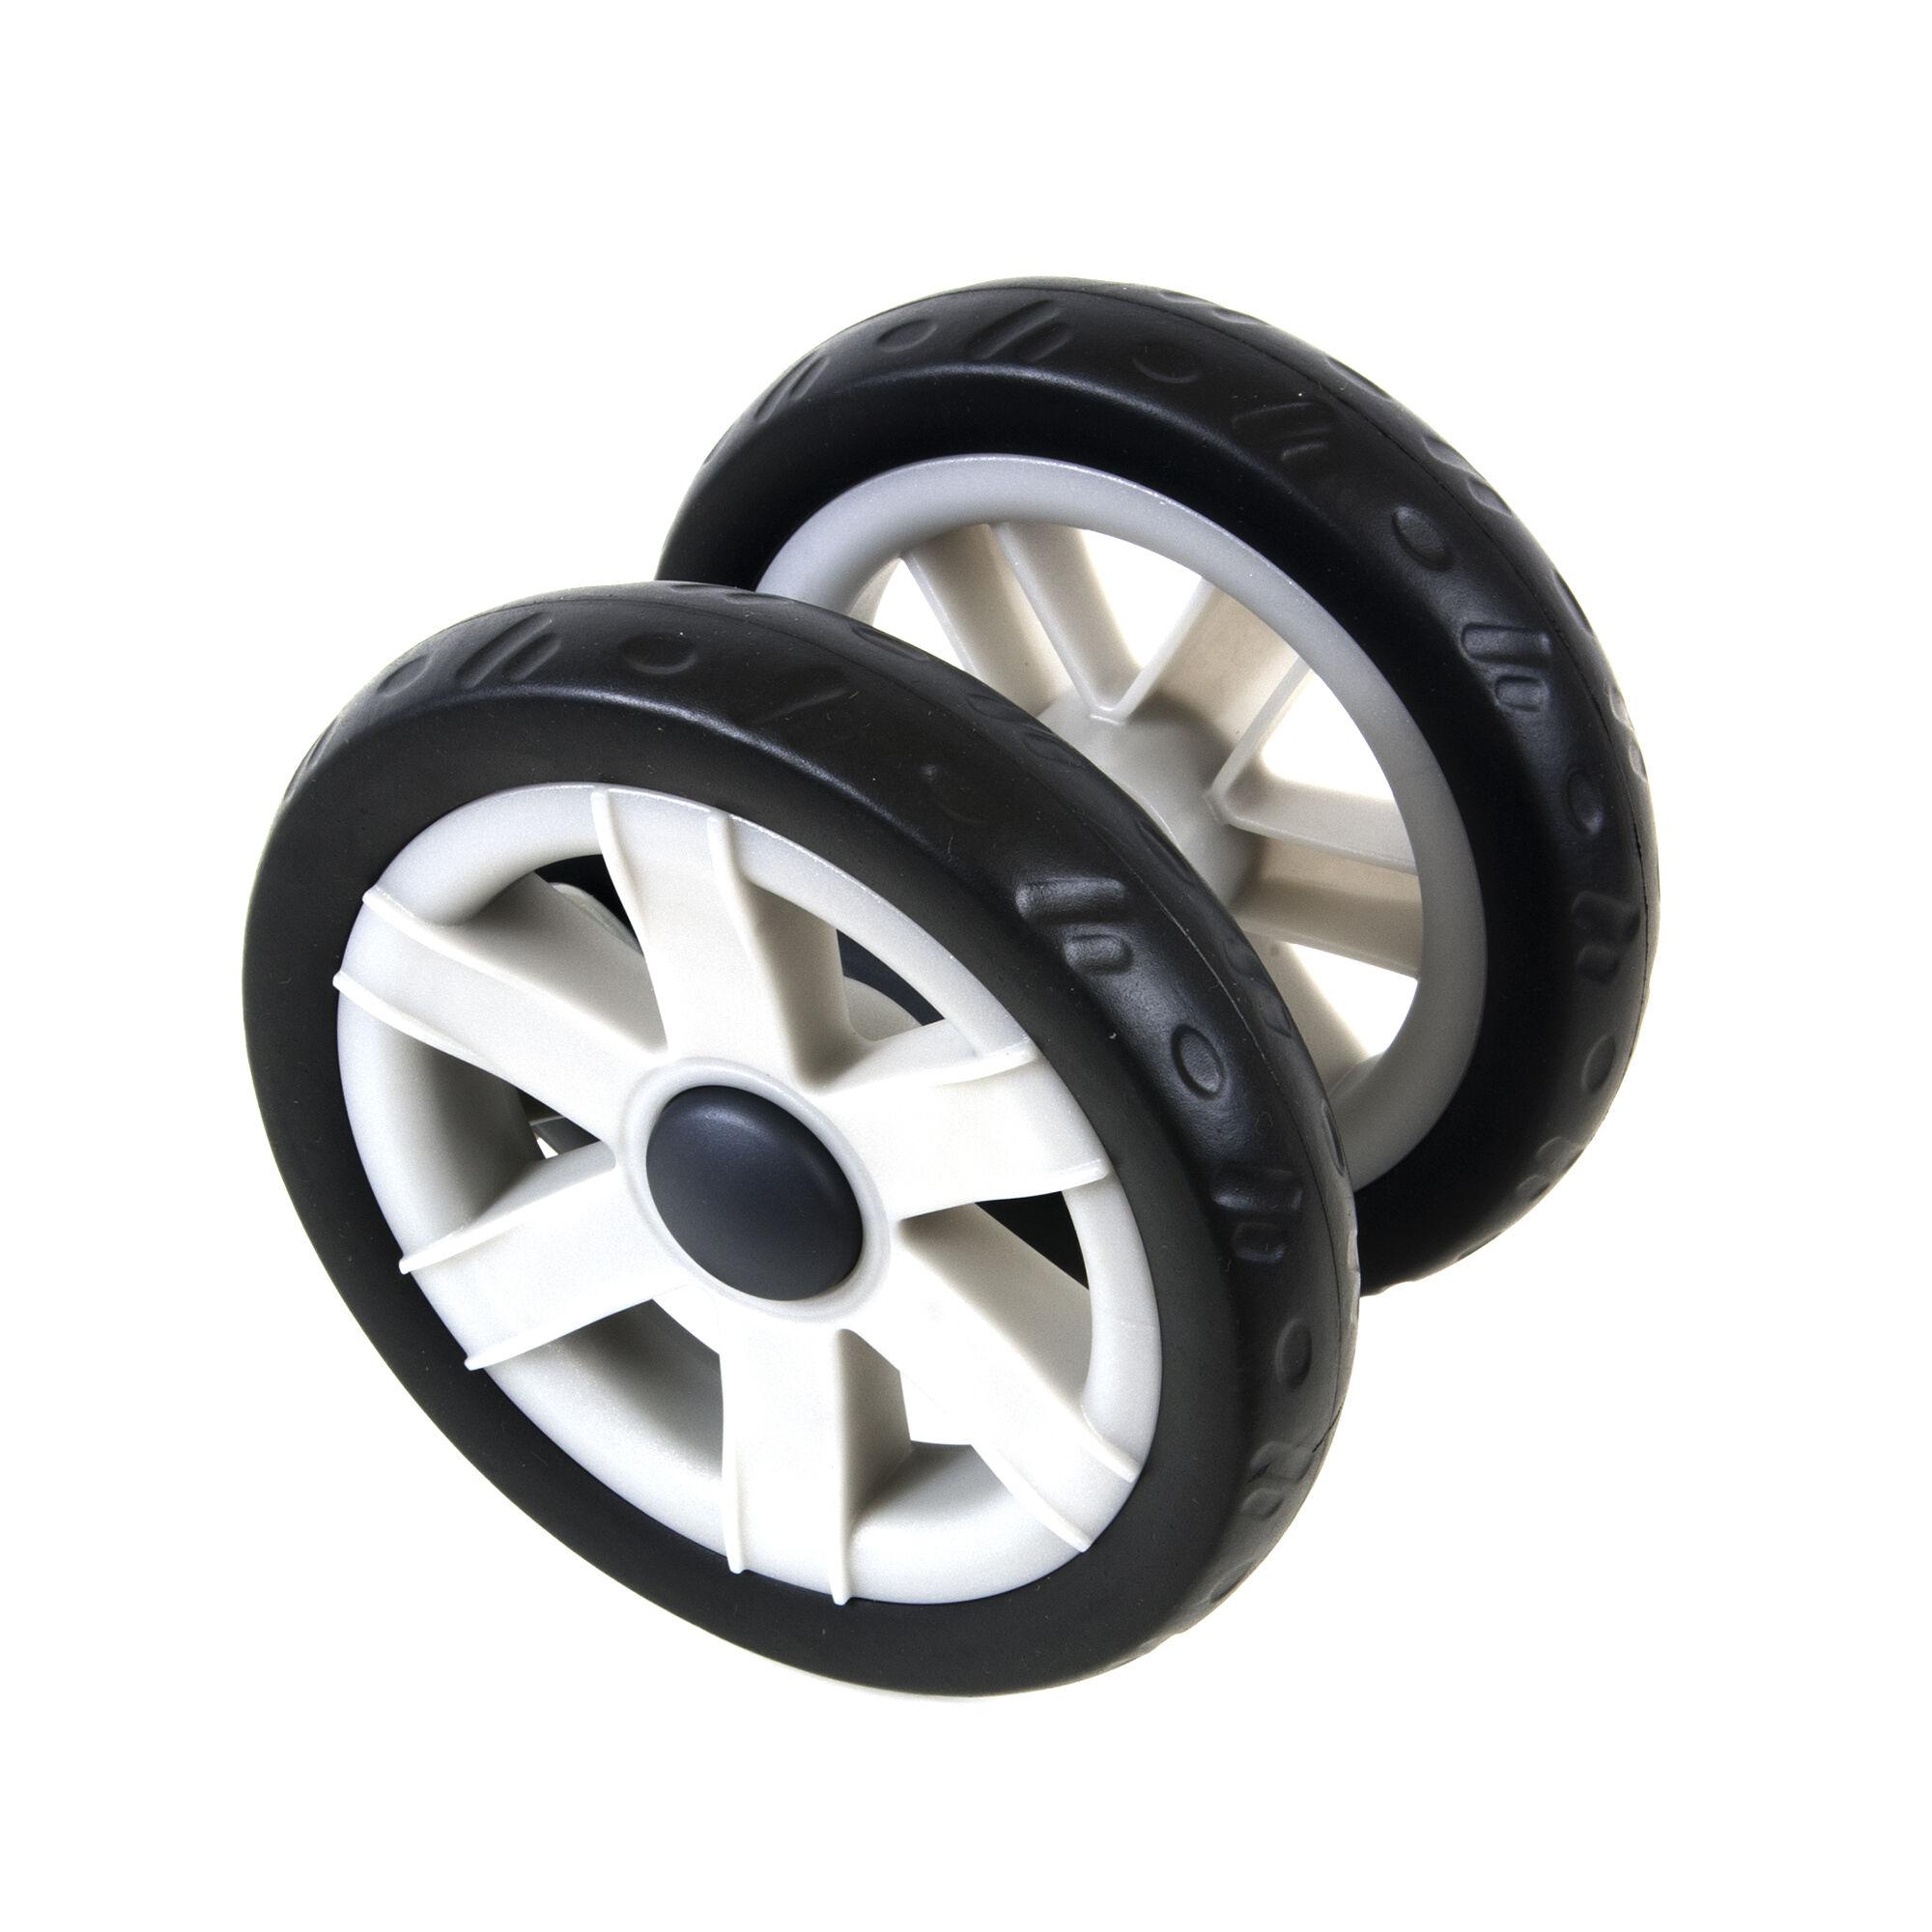 C6 Stroller Front Wheel Assembly